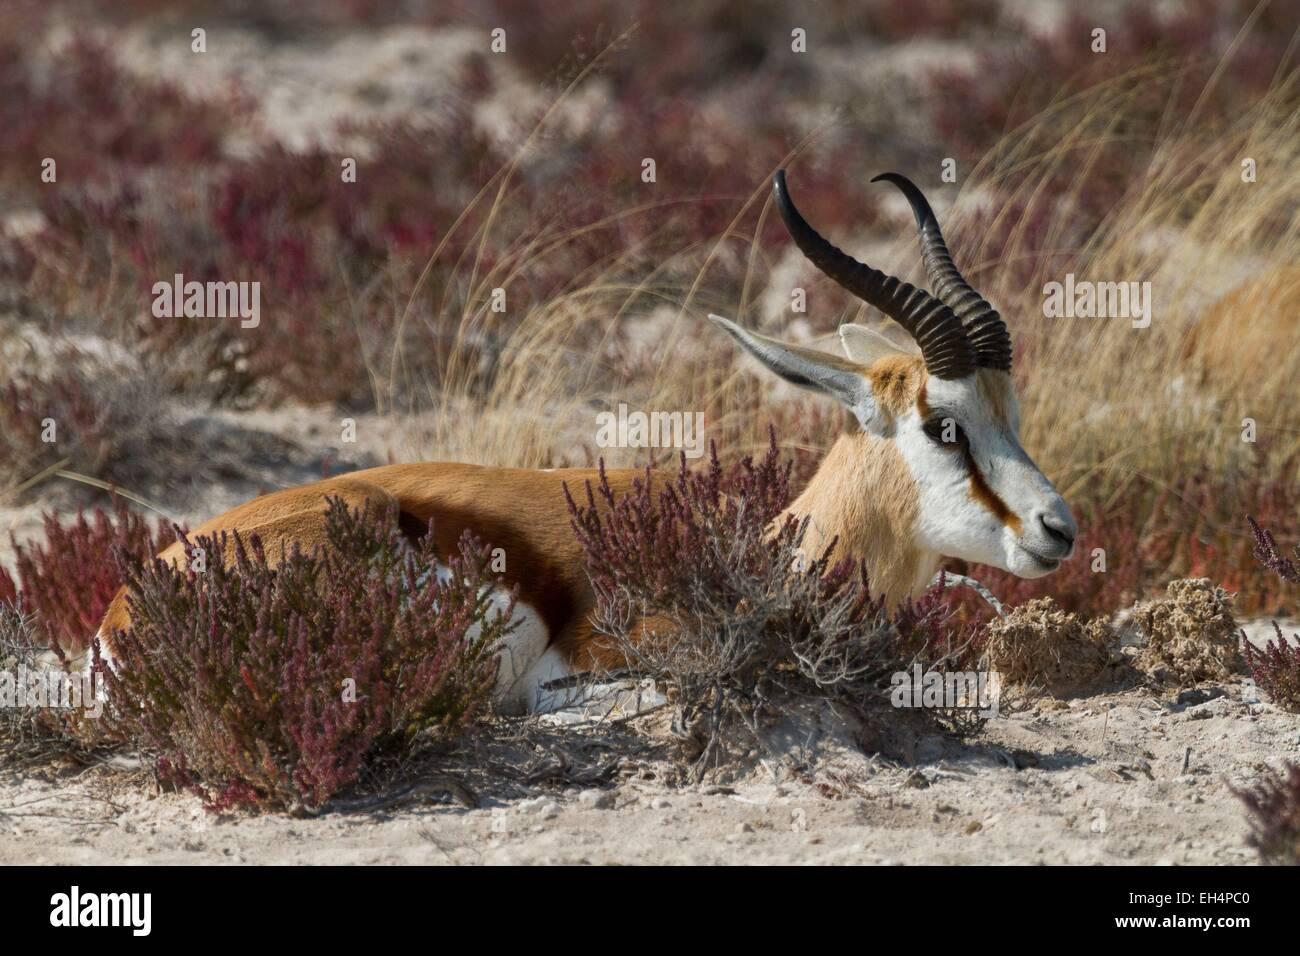 Namibia, Oshikoto region, Etosha National Park, springbok (Antidorcas marsupialis) - Stock Image